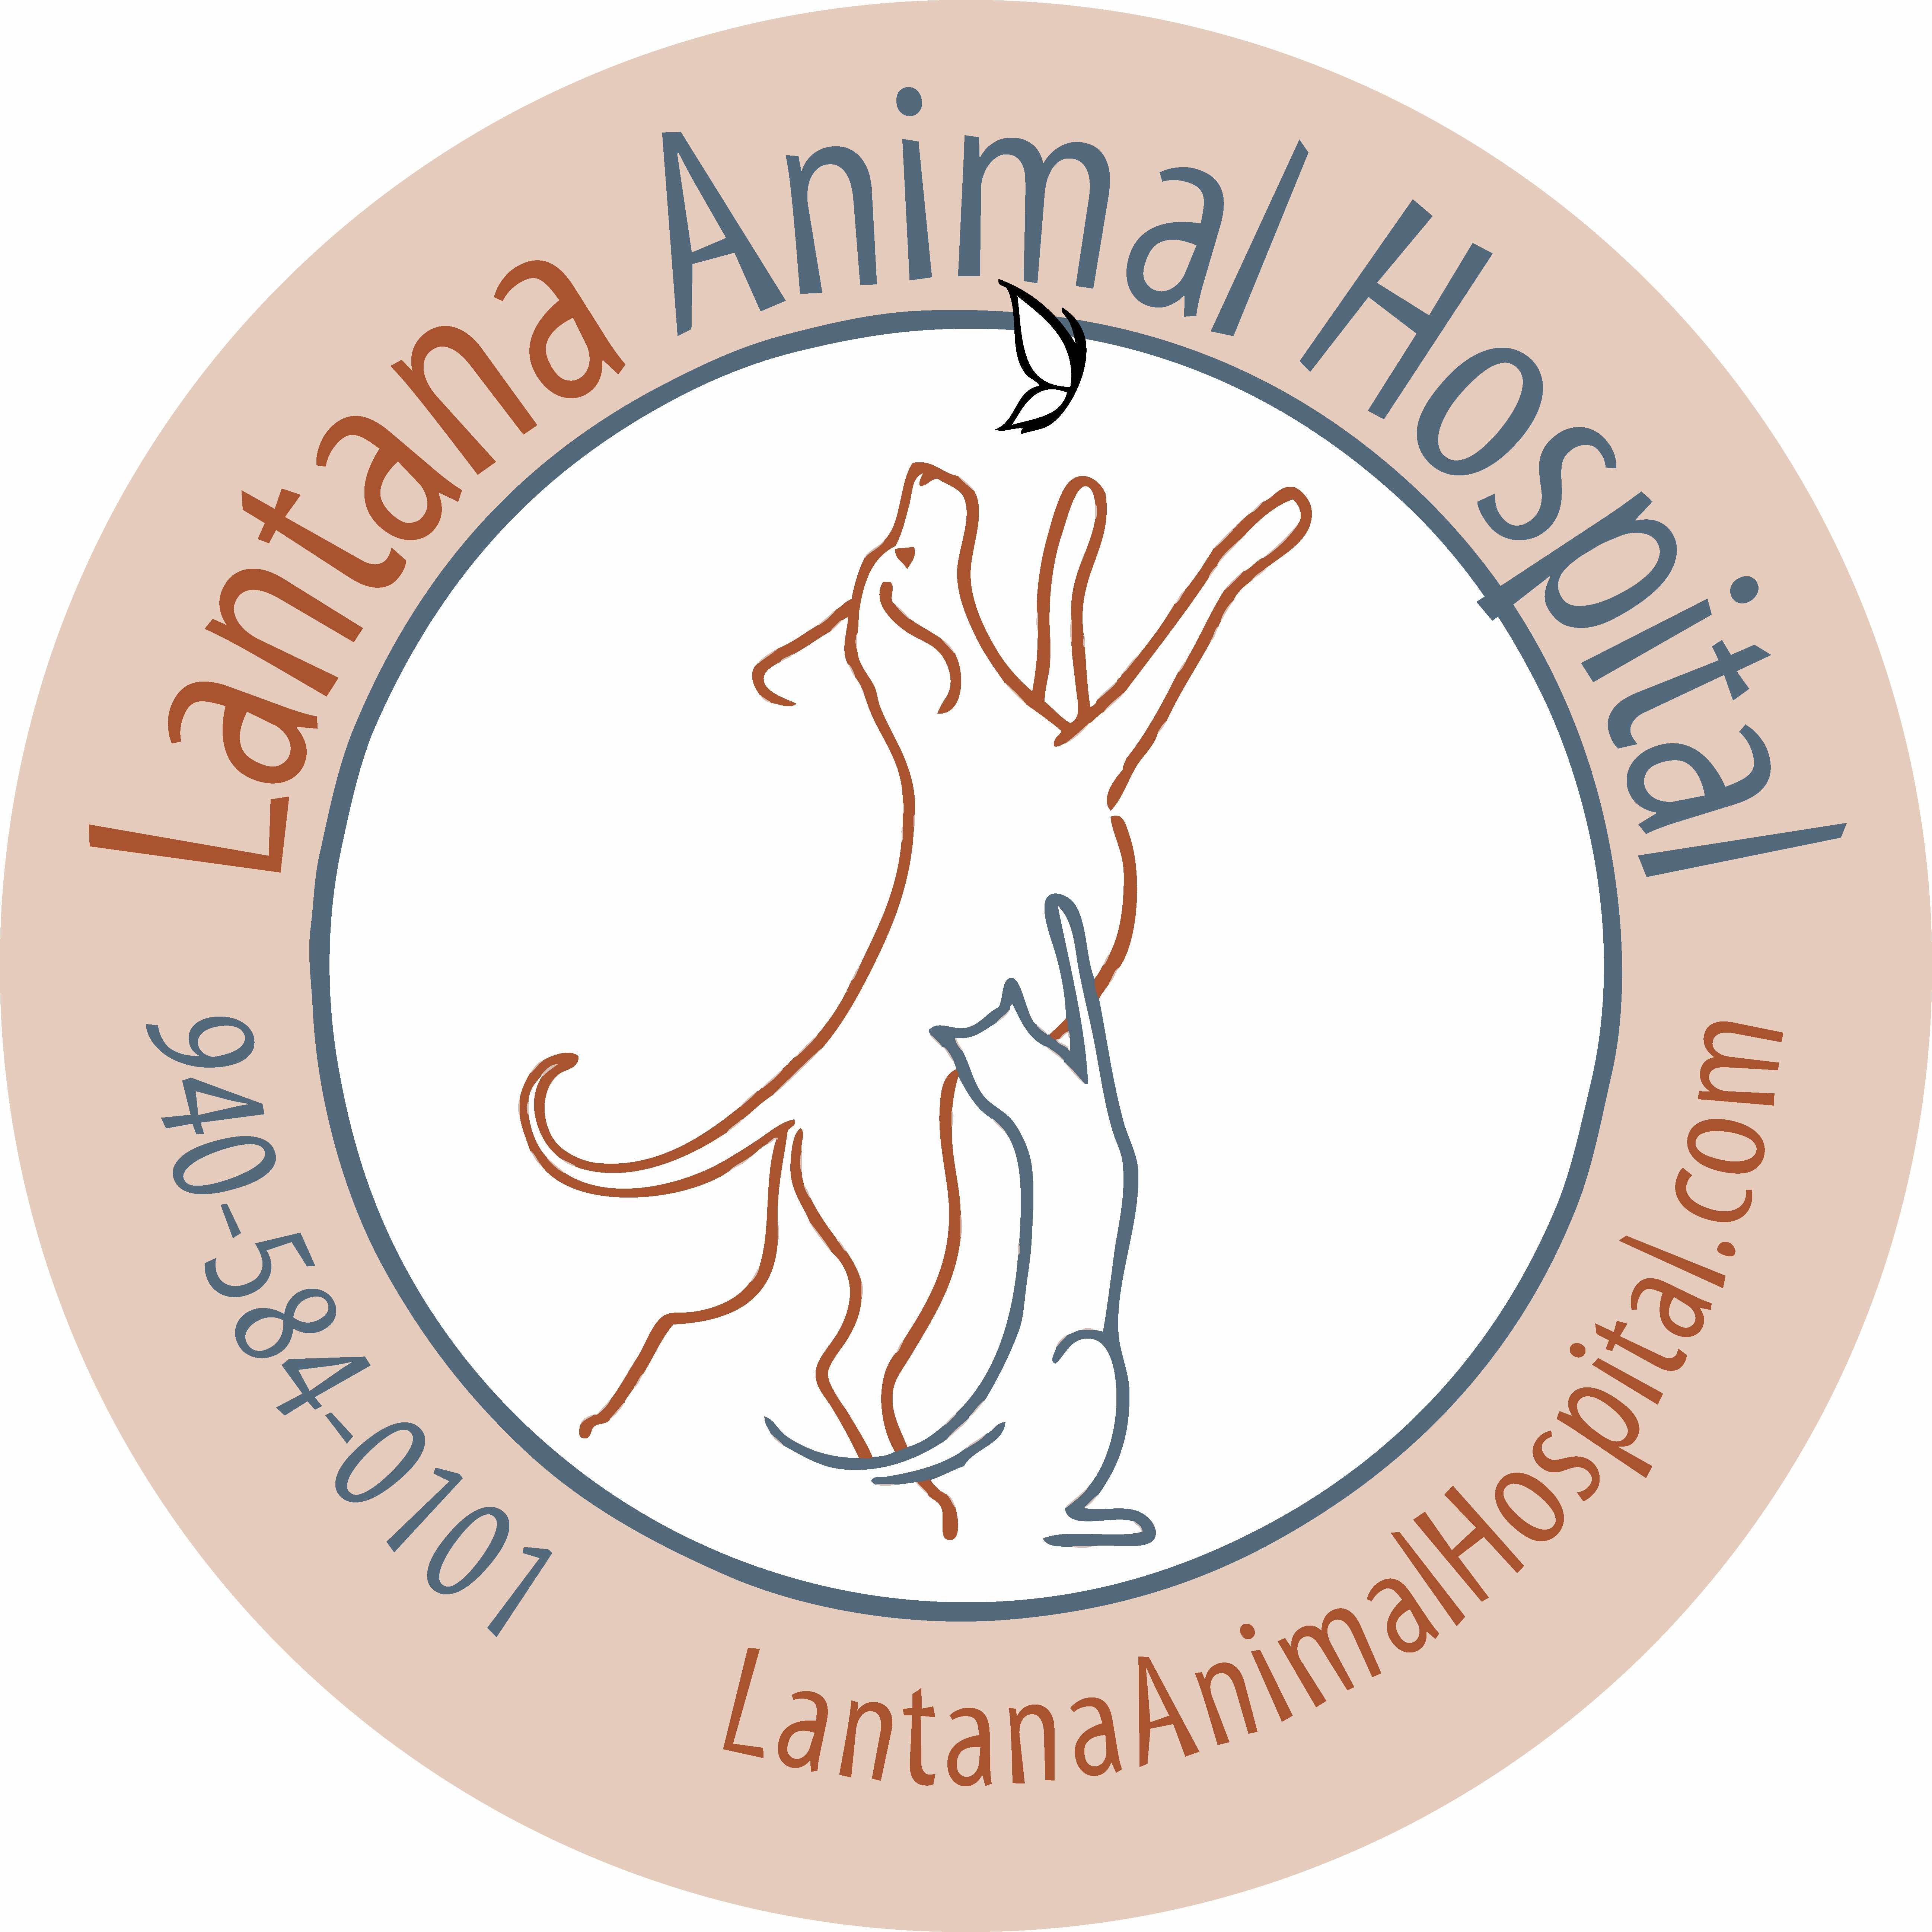 Lantana Animal Hospital